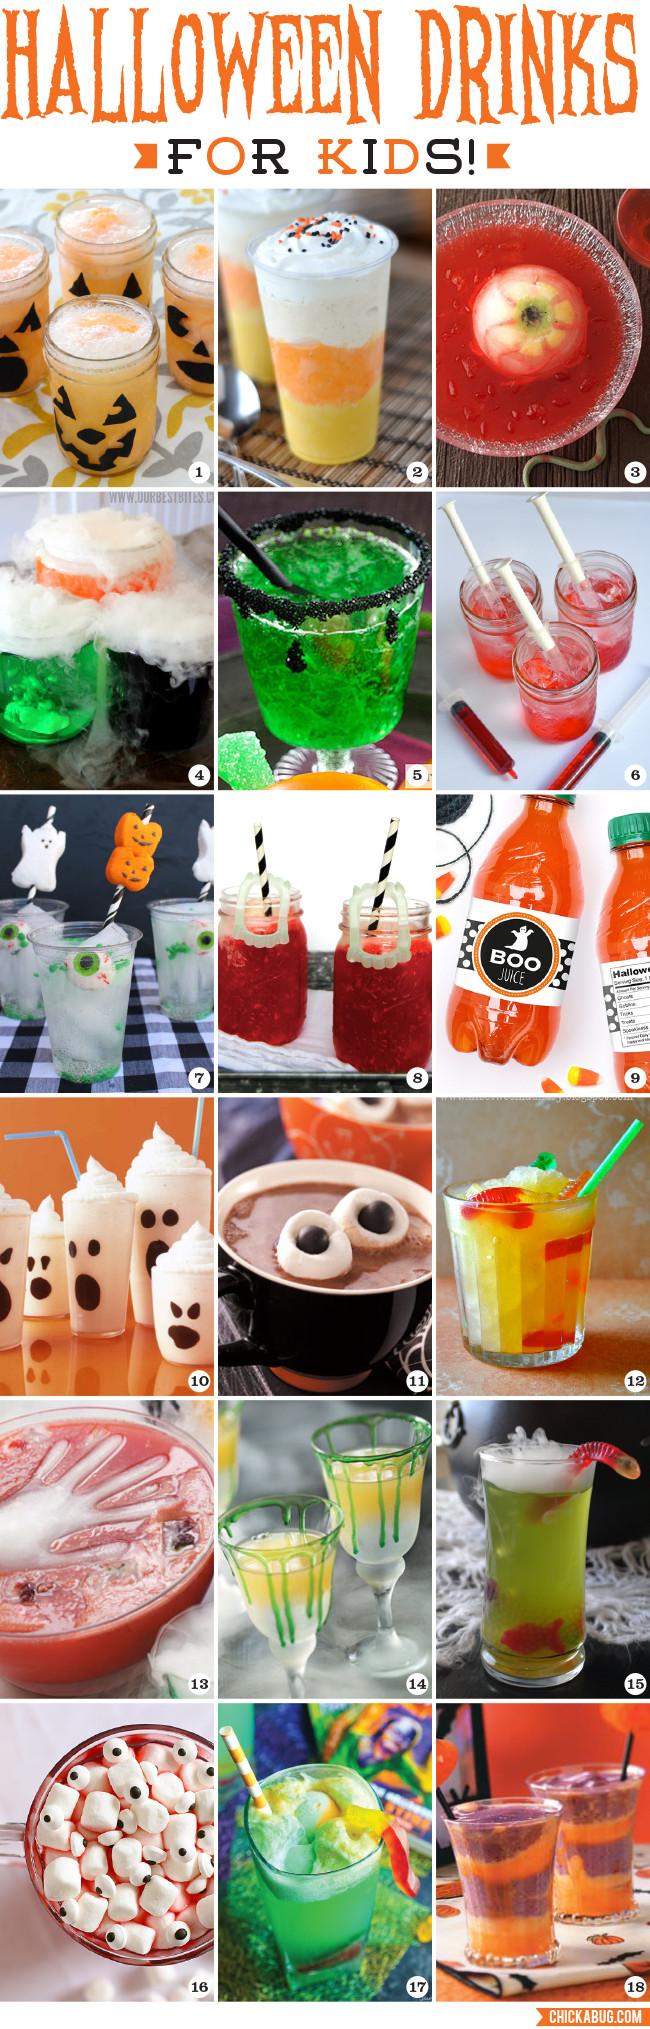 Halloween Party Drinks For Kids  Halloween Drinks for Kids